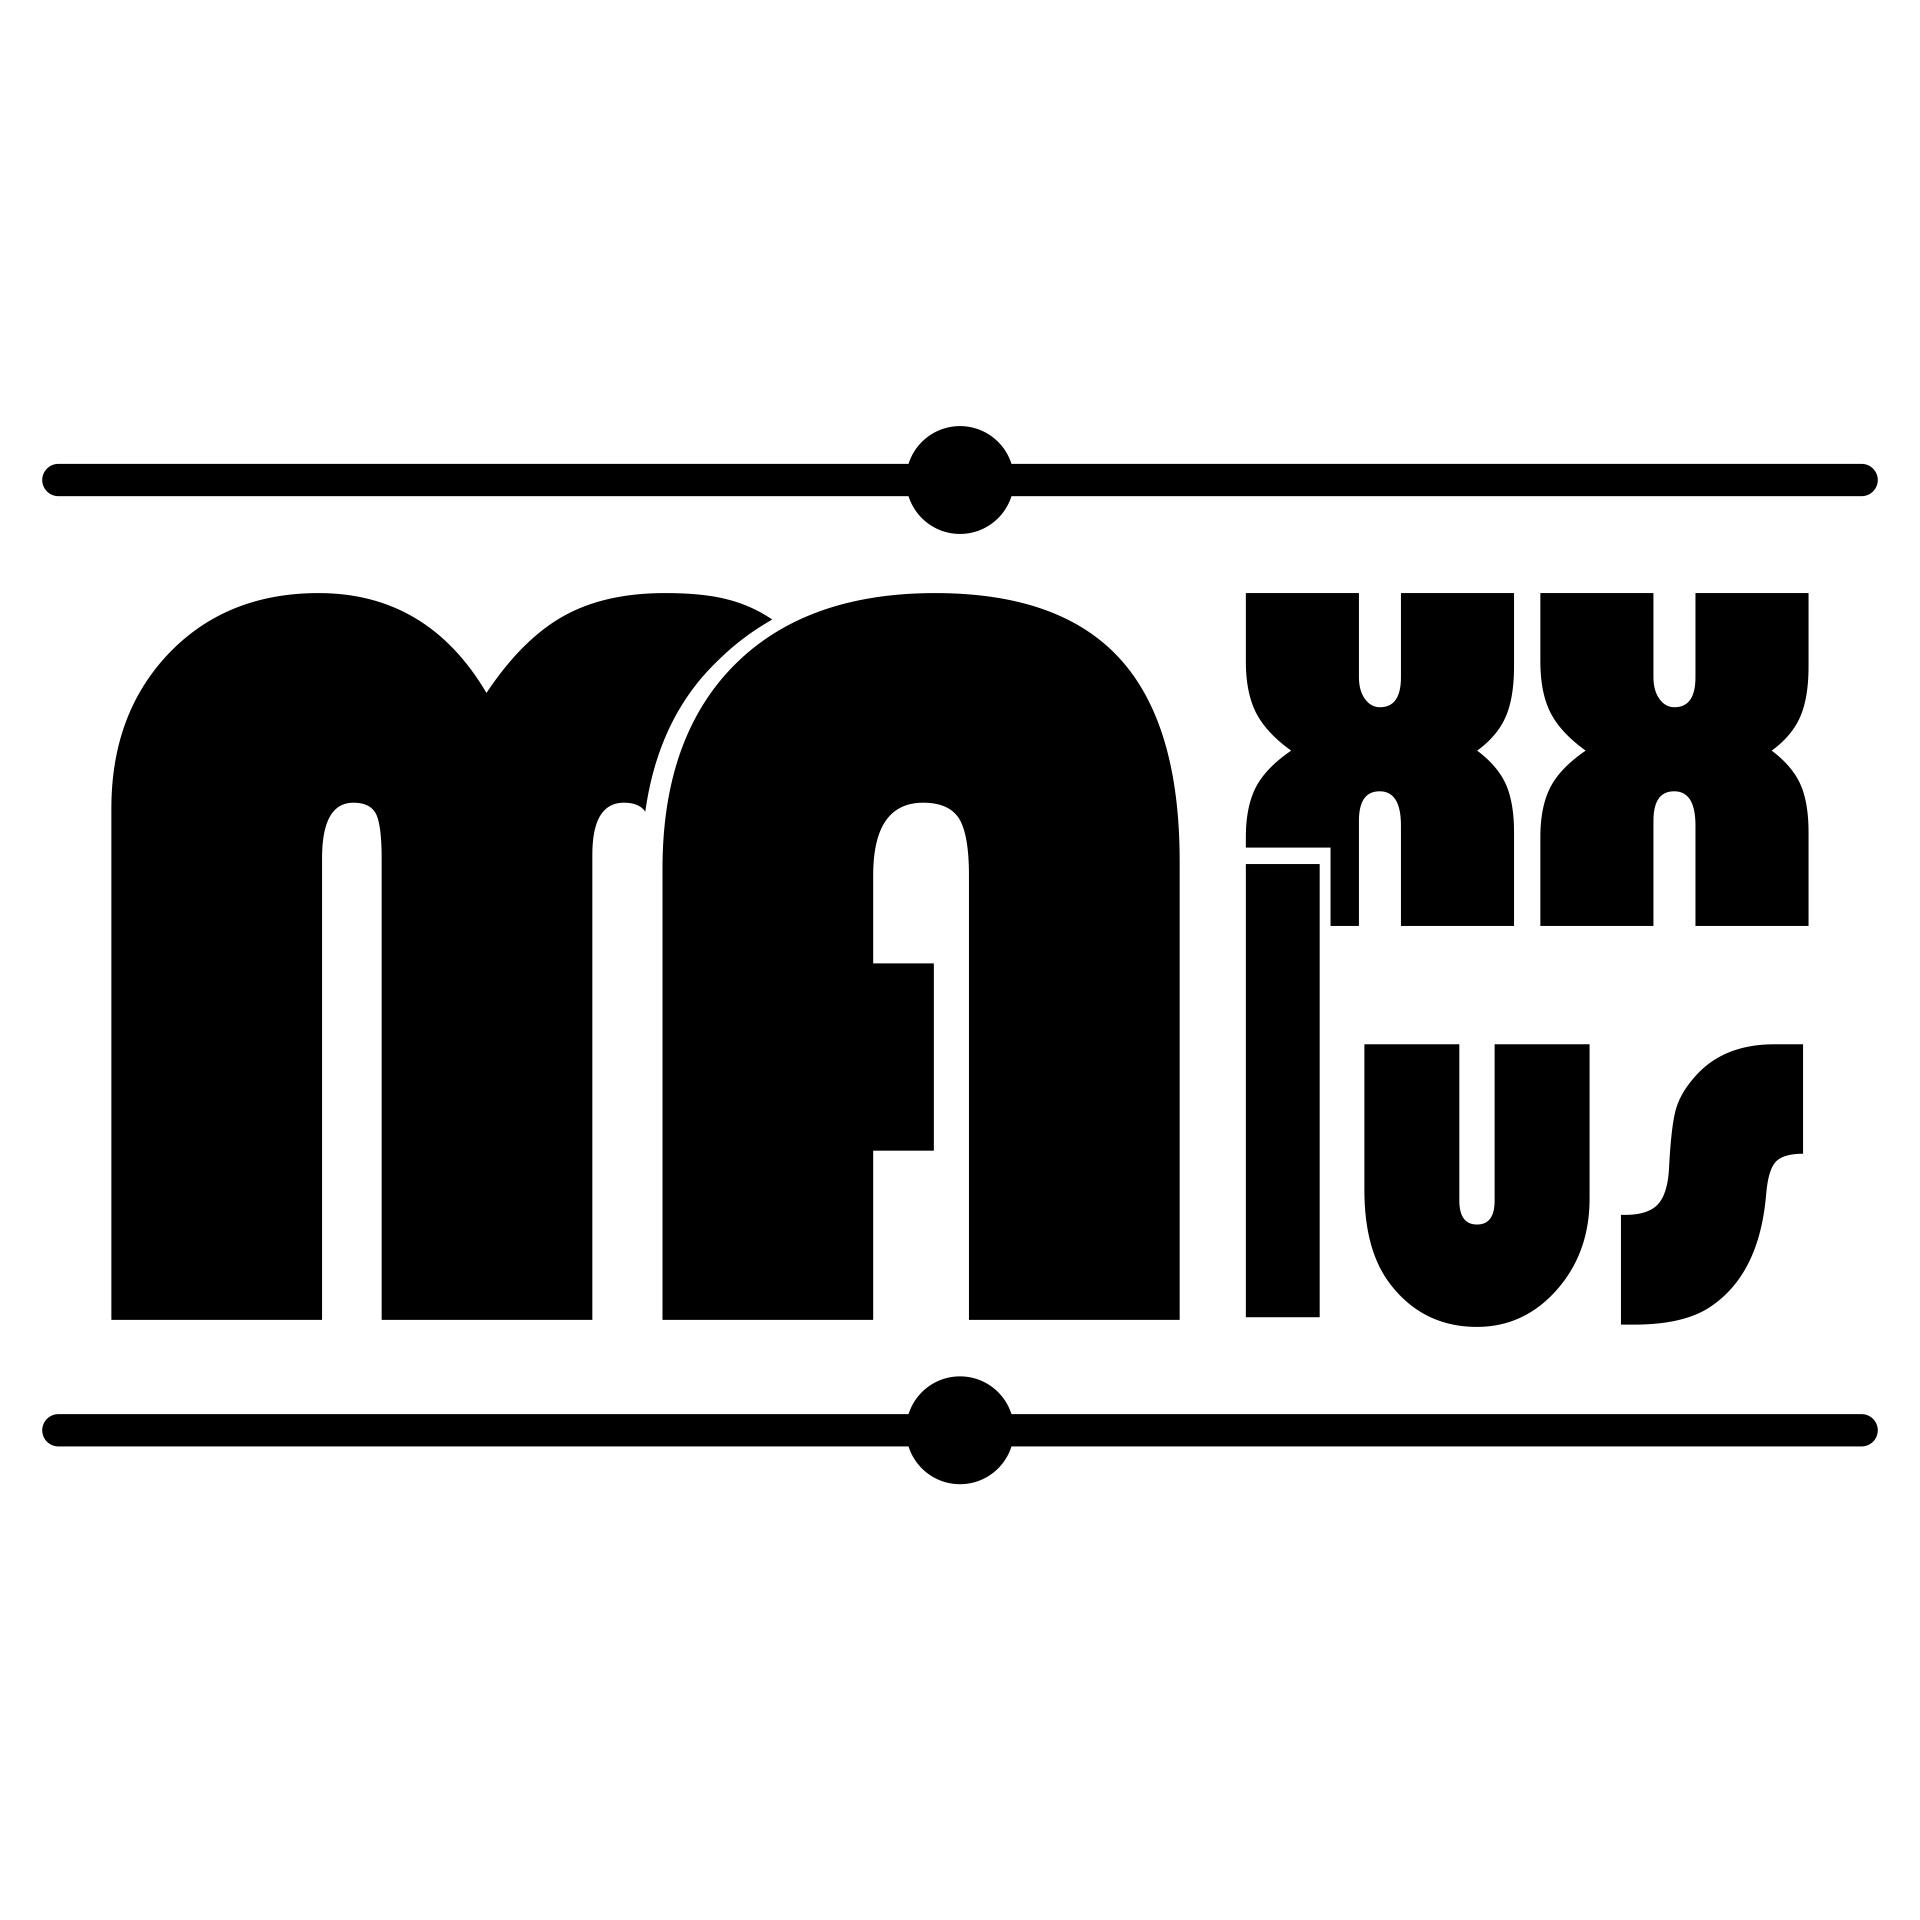 Логотип для нового бренда повседневной посуды фото f_9825b9d0715bf420.jpg